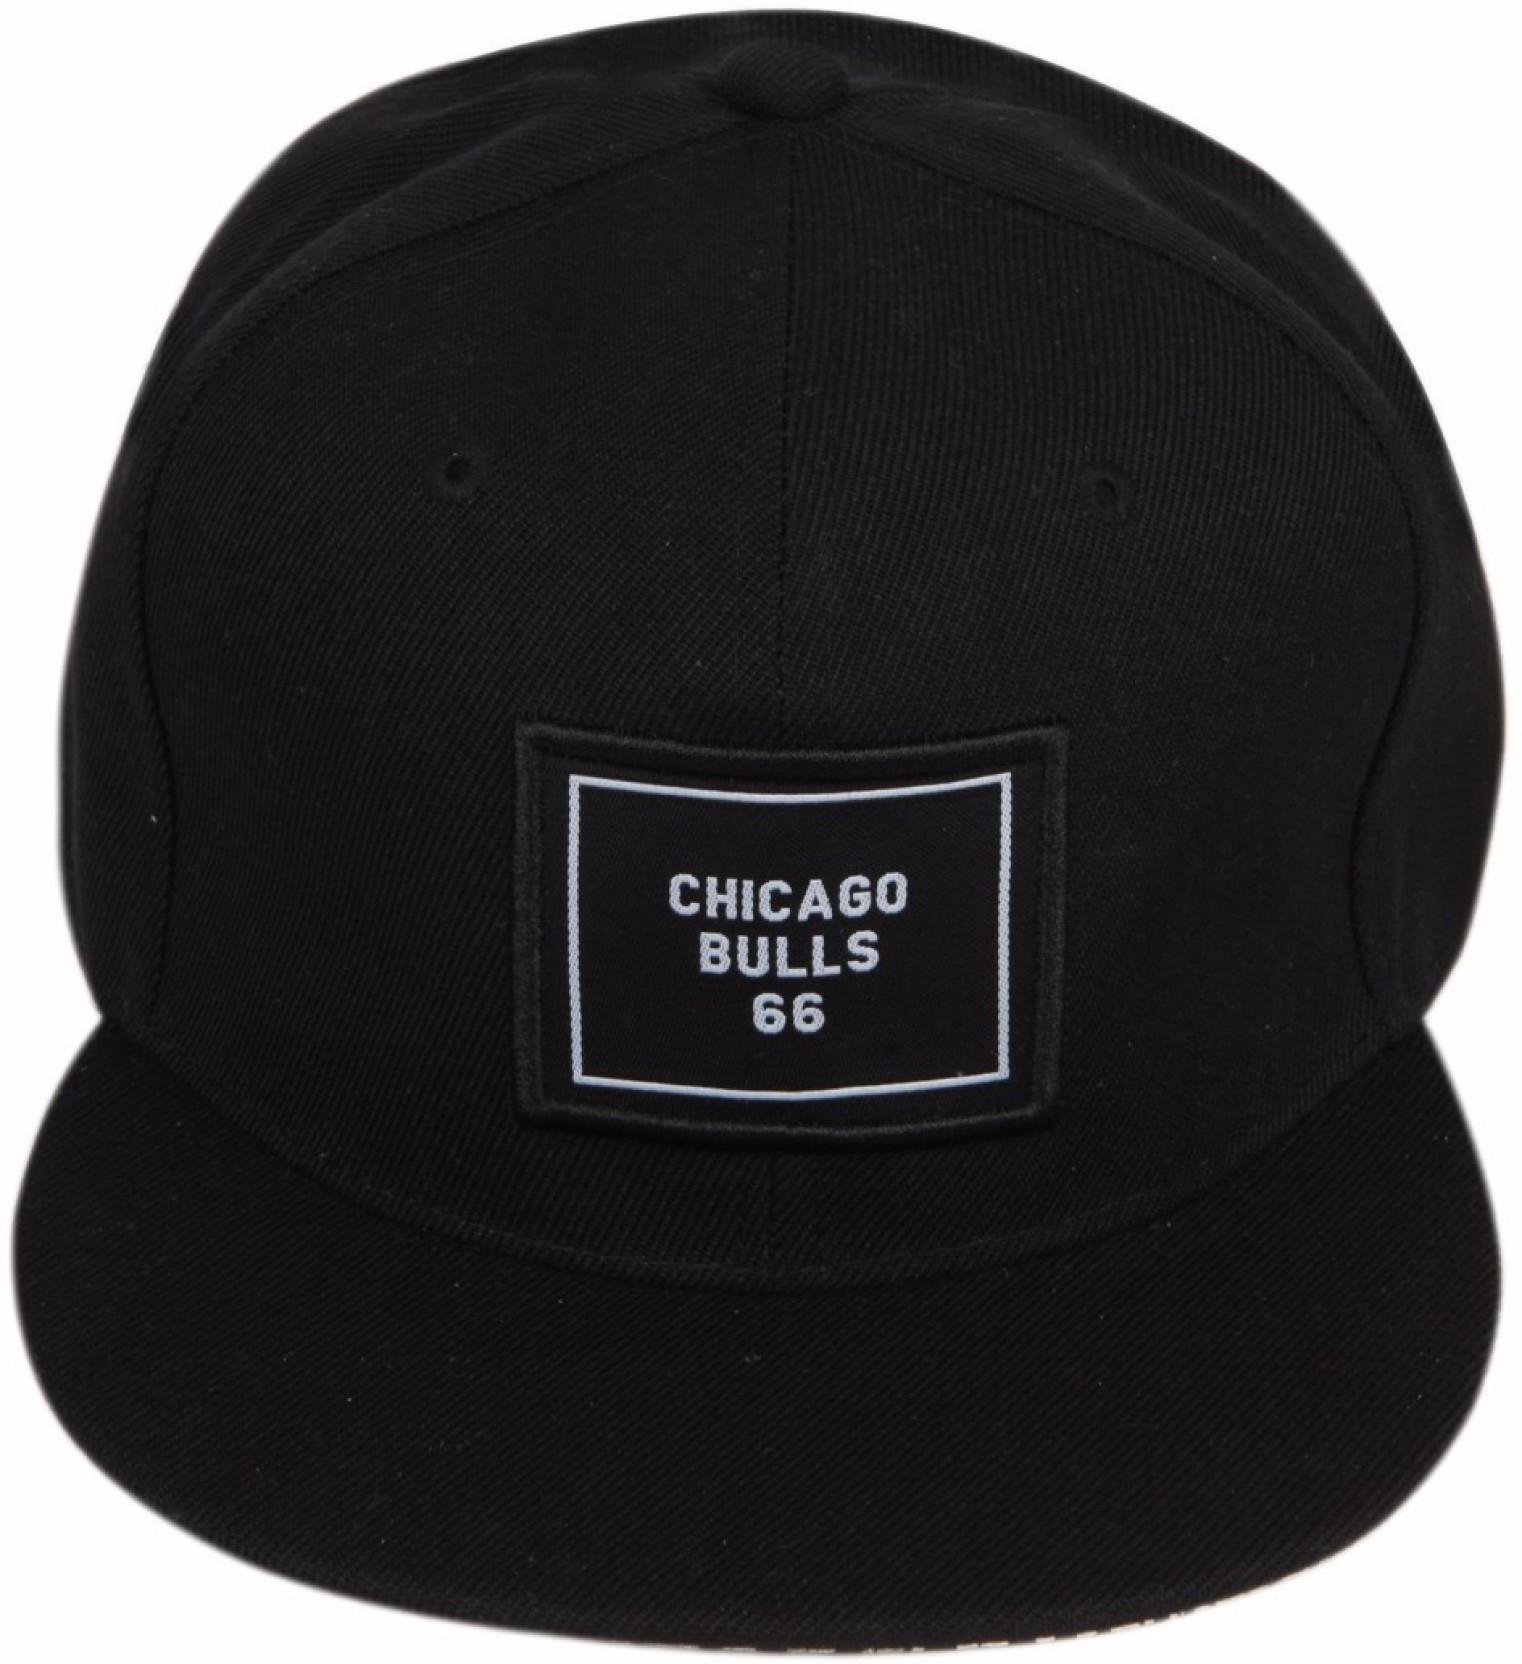 5c7cd956 Snapback Baseball Caps Men Boys Hip Hop Cap Hats Flat Fancy Chicago Cotton  100% Clothes, ...